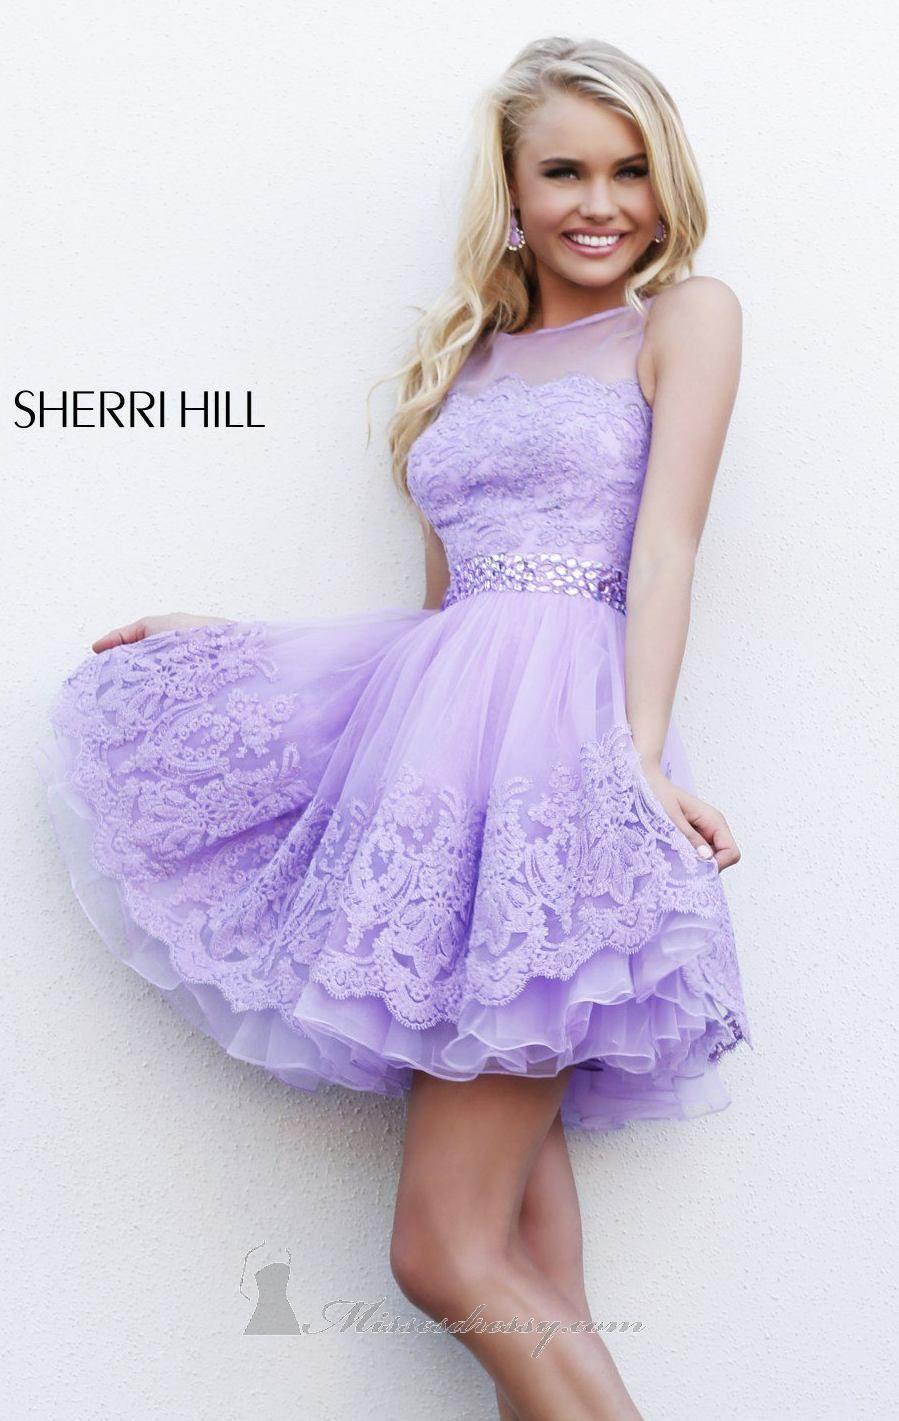 Embellished Mini Dress by Sherri Hill | Pinterest | Moda vestidos